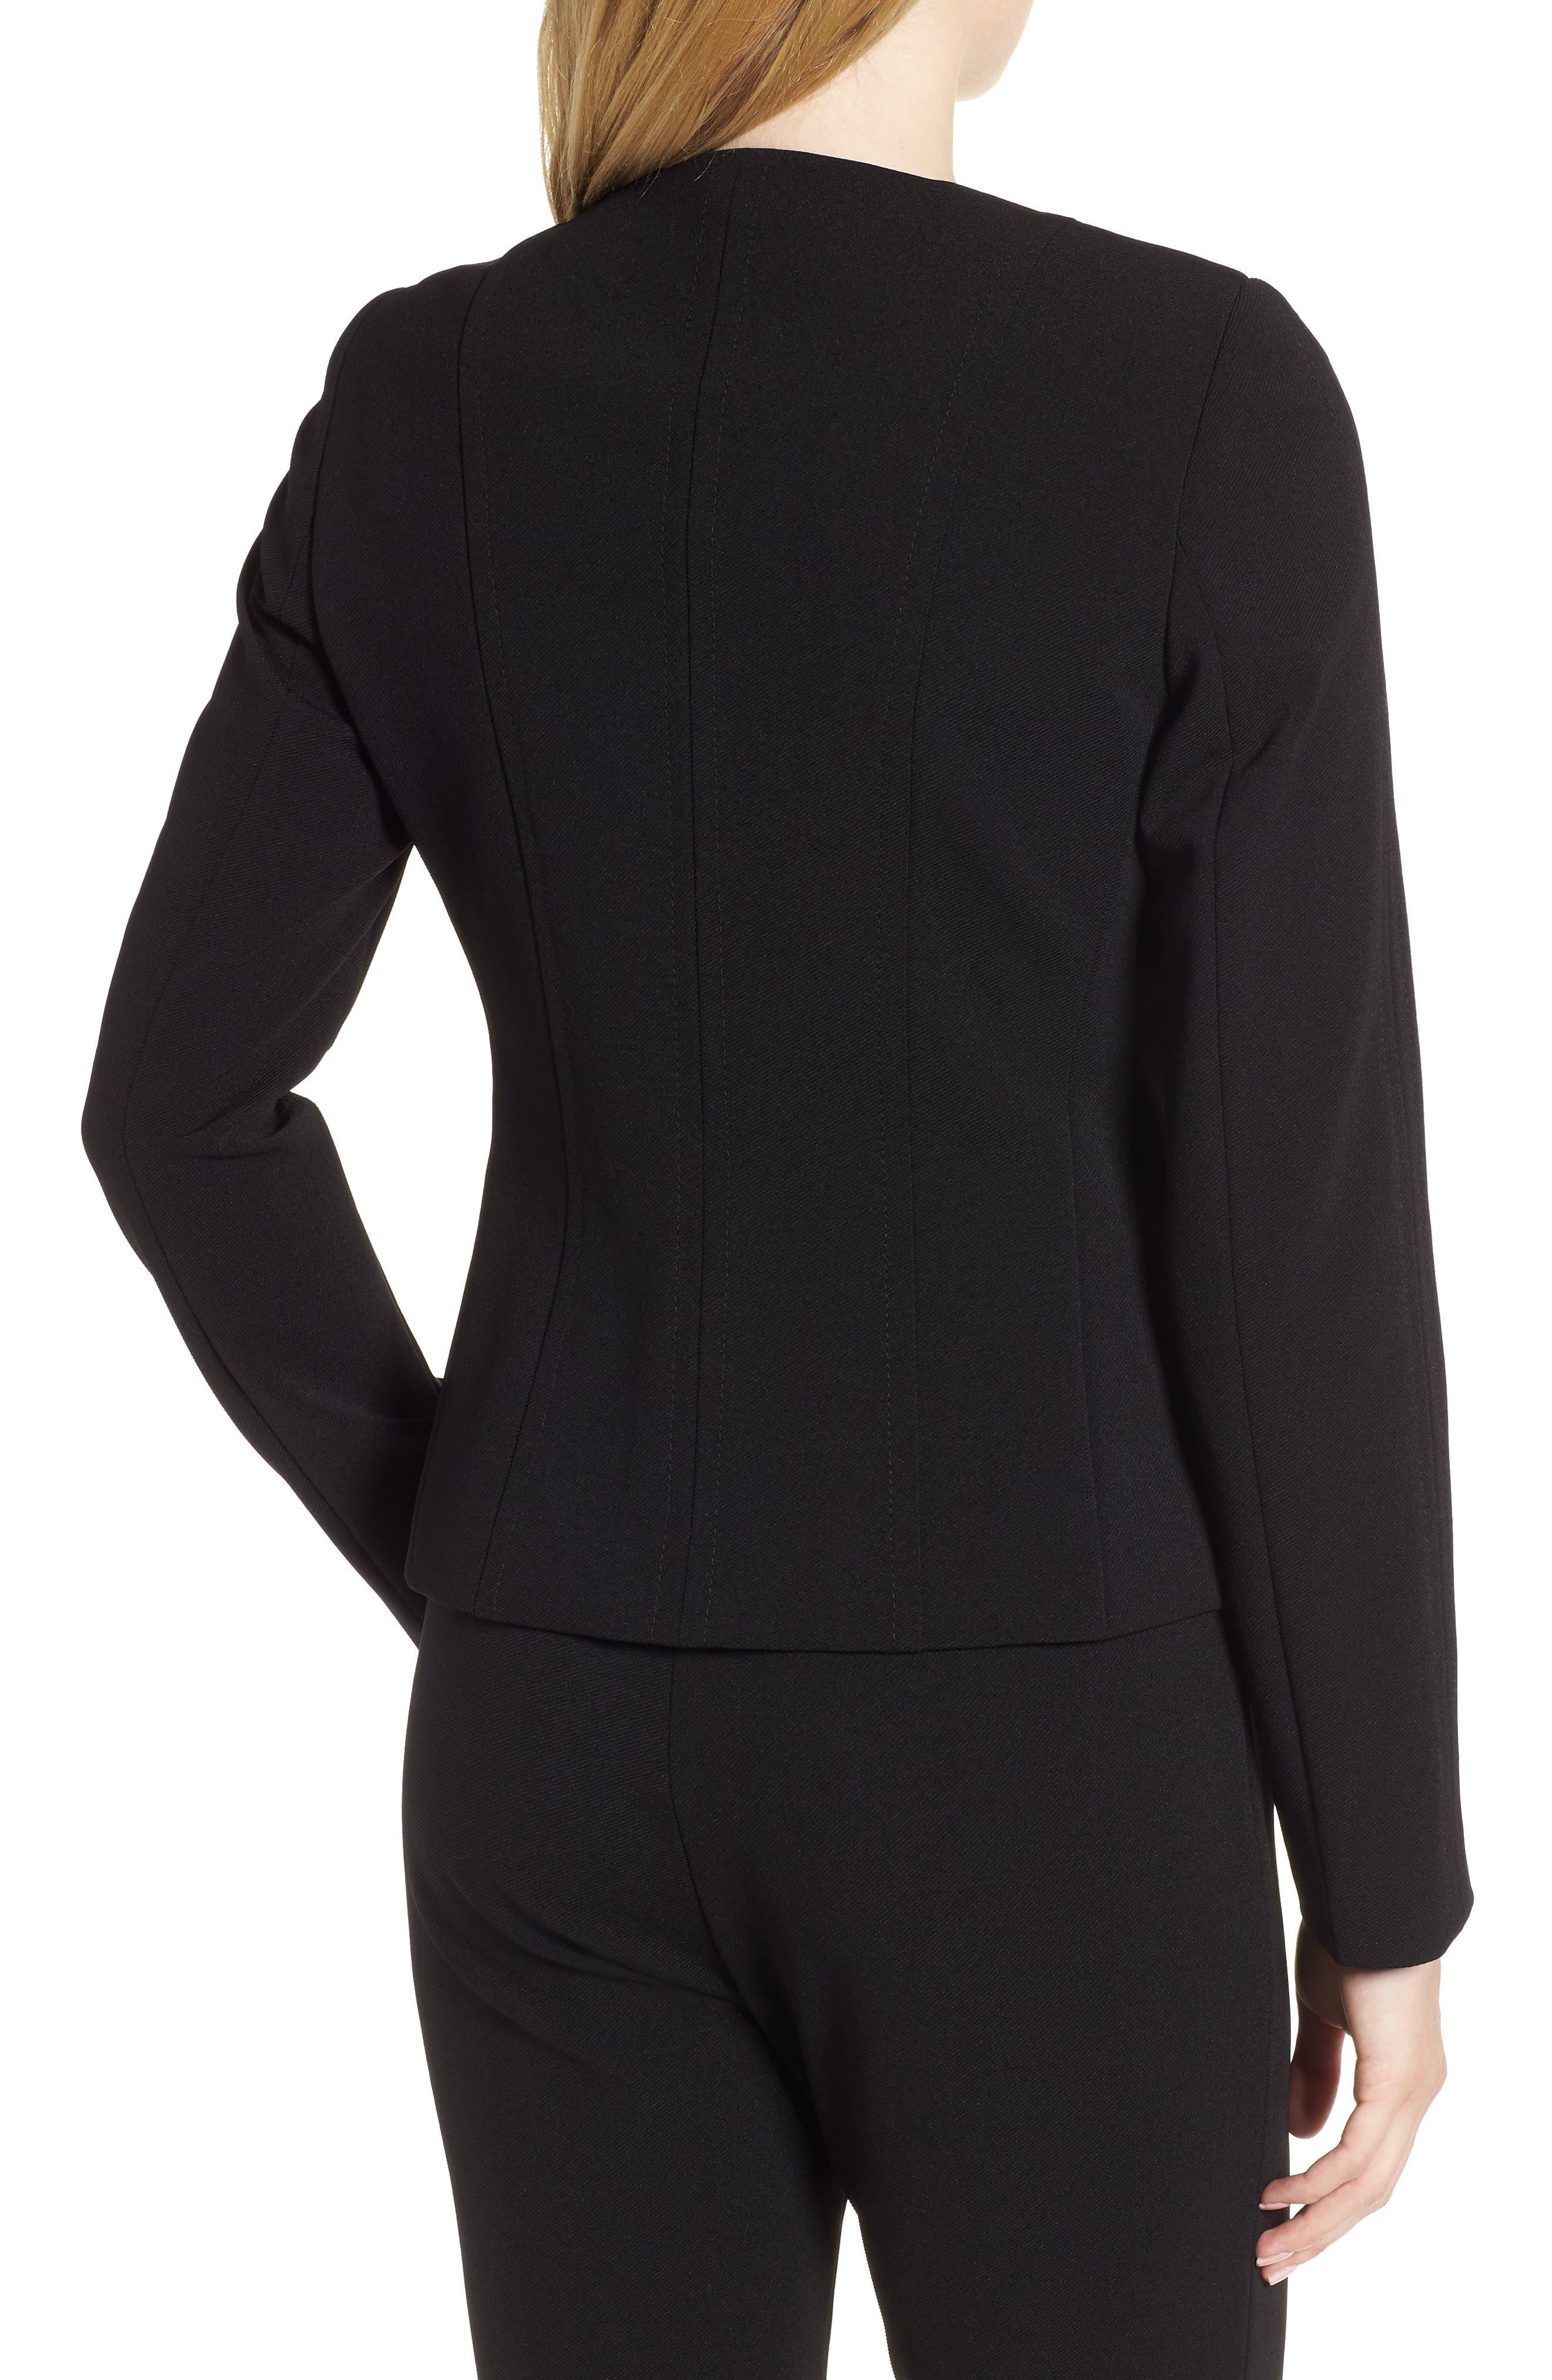 Jazulara Twill Jersey Suit Jacket,                             Alternate thumbnail 2, color,                             001